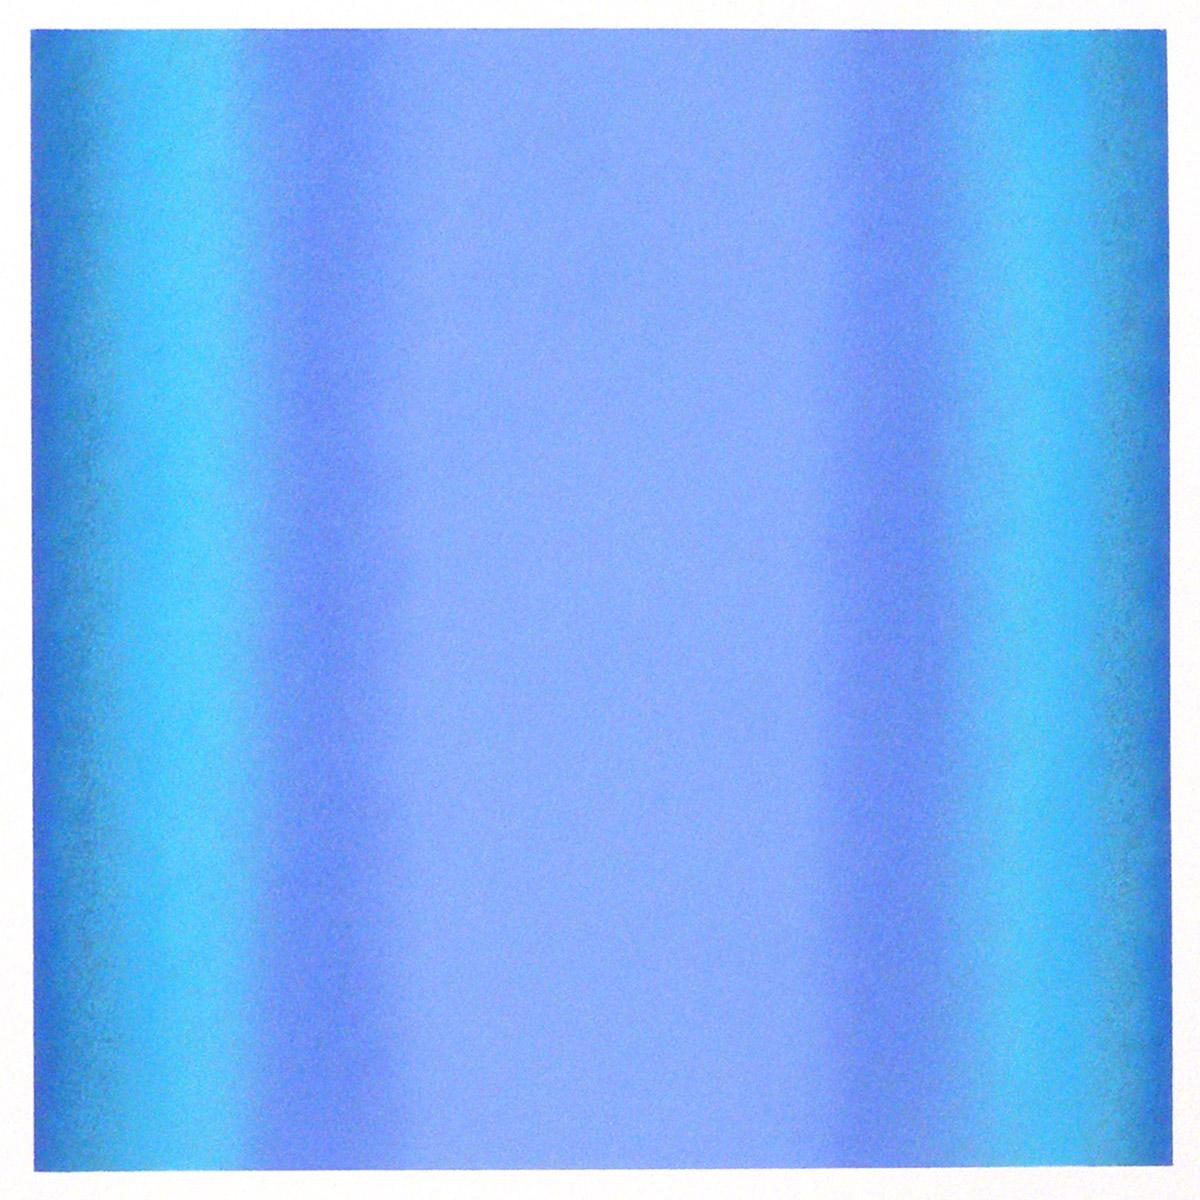 Cool-Light Ultramarine-Cobalt, Warm-Light Cool-Light Series, 2012, pastel on paper, image: 14 x 14 in. (36 x 36 cm.), sheet: 30 x 22 in. (76 x 56 cm.)